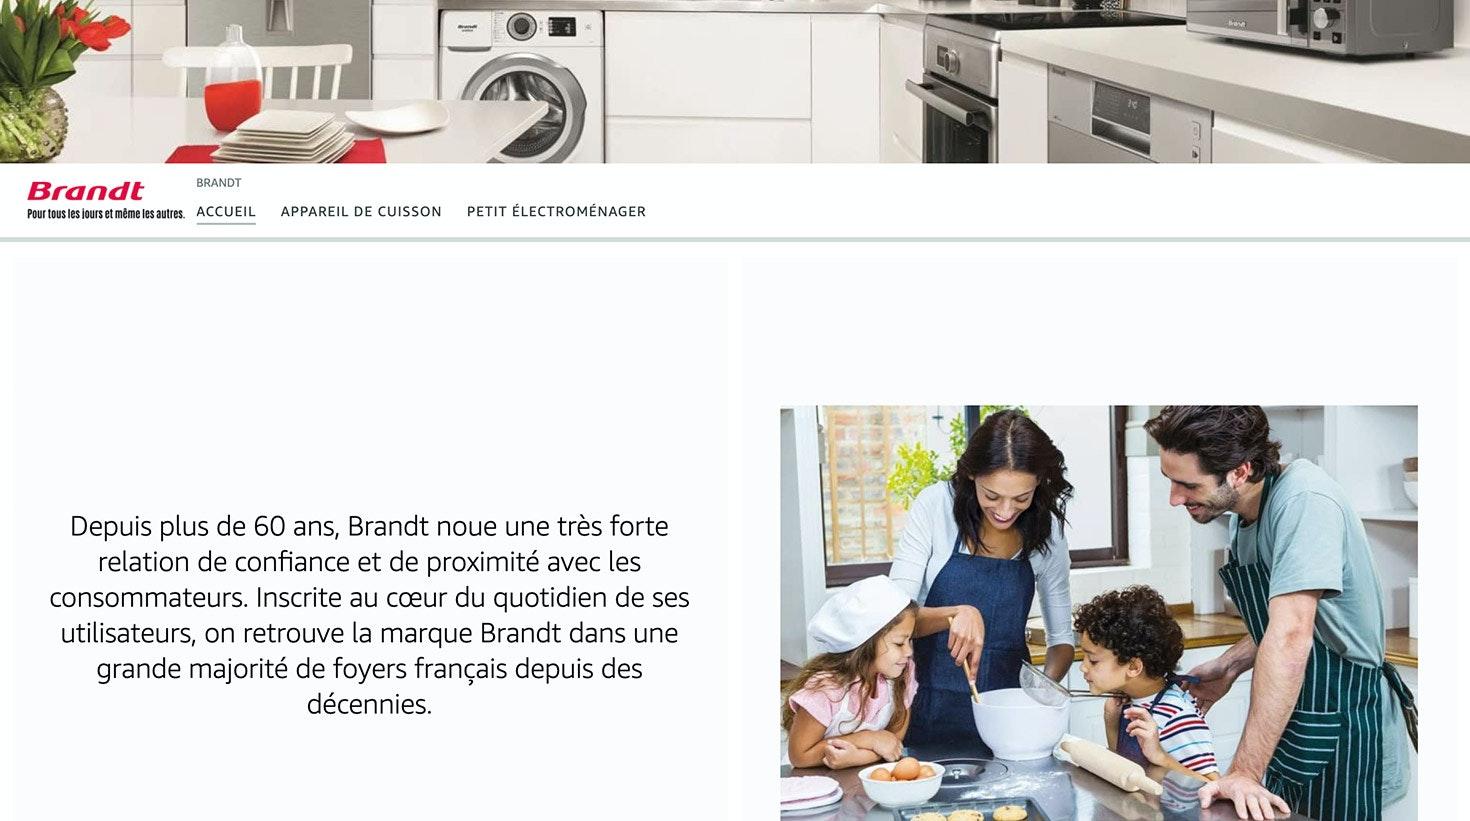 Le Brand Store de la marque Brandt sur Amazon